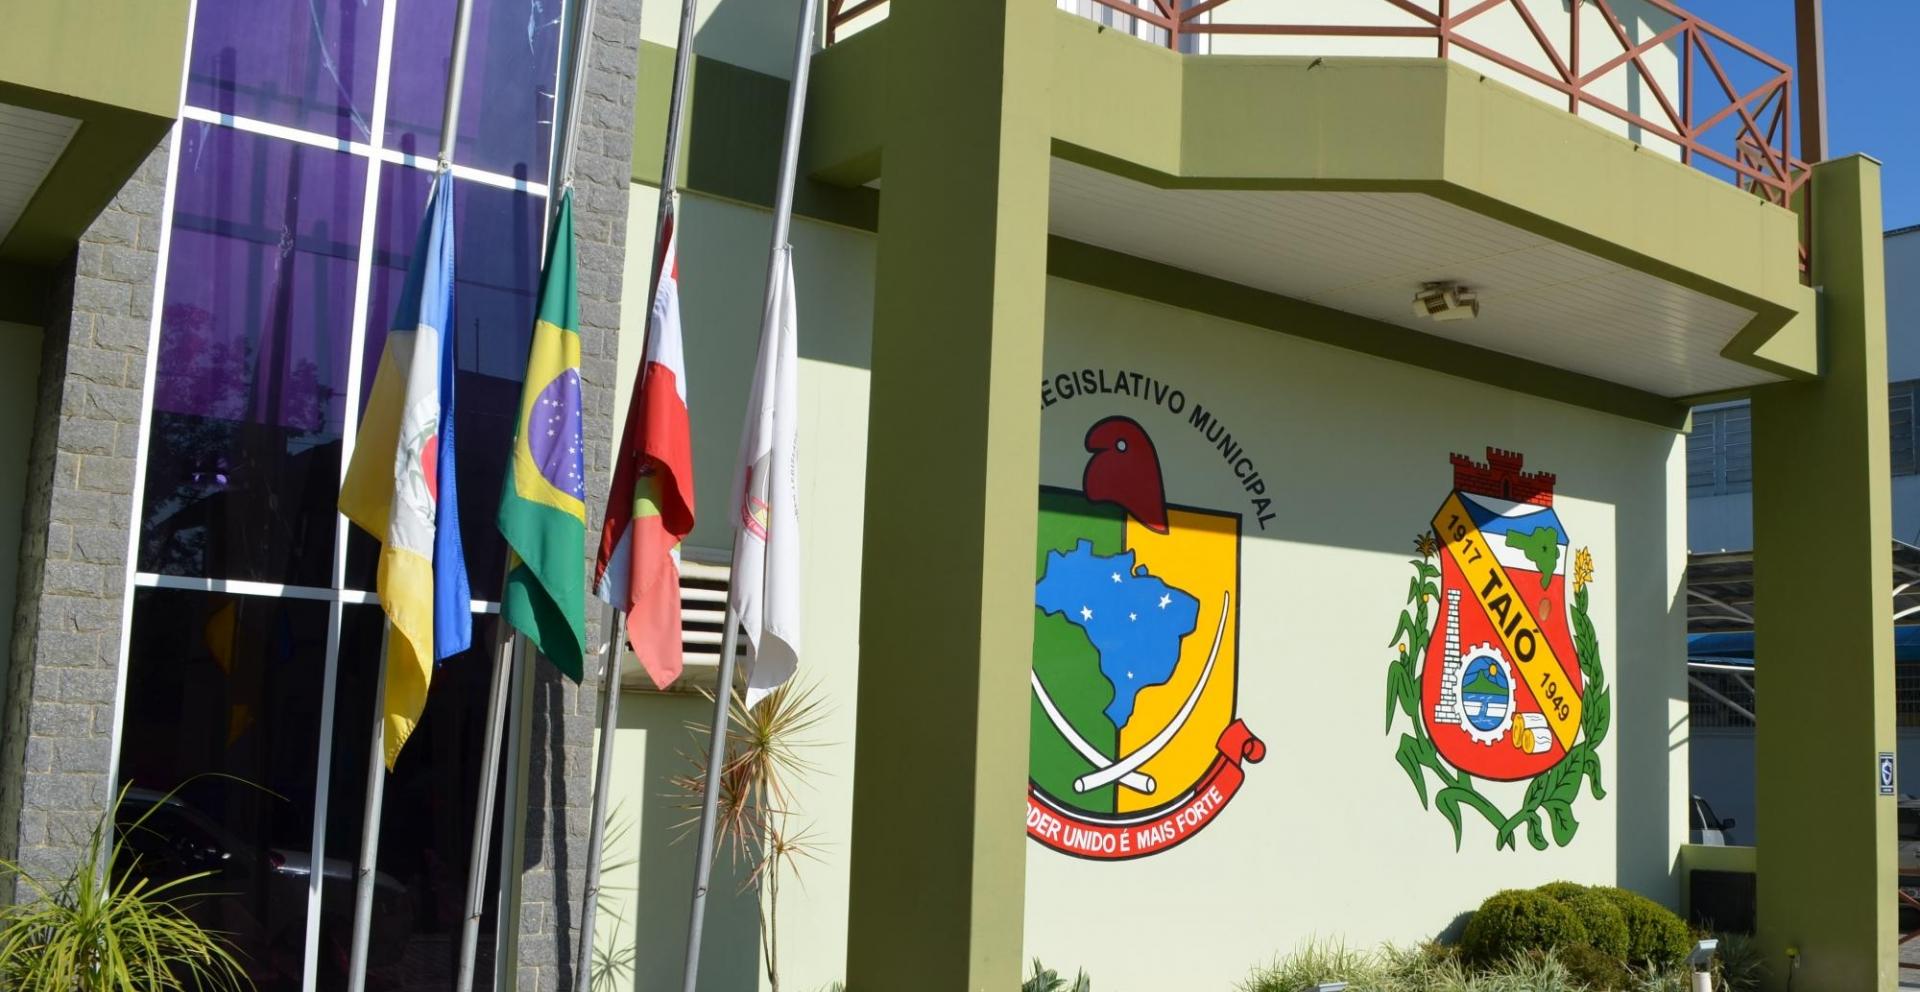 Nota Oficial da Câmara de Vereadores de Taió